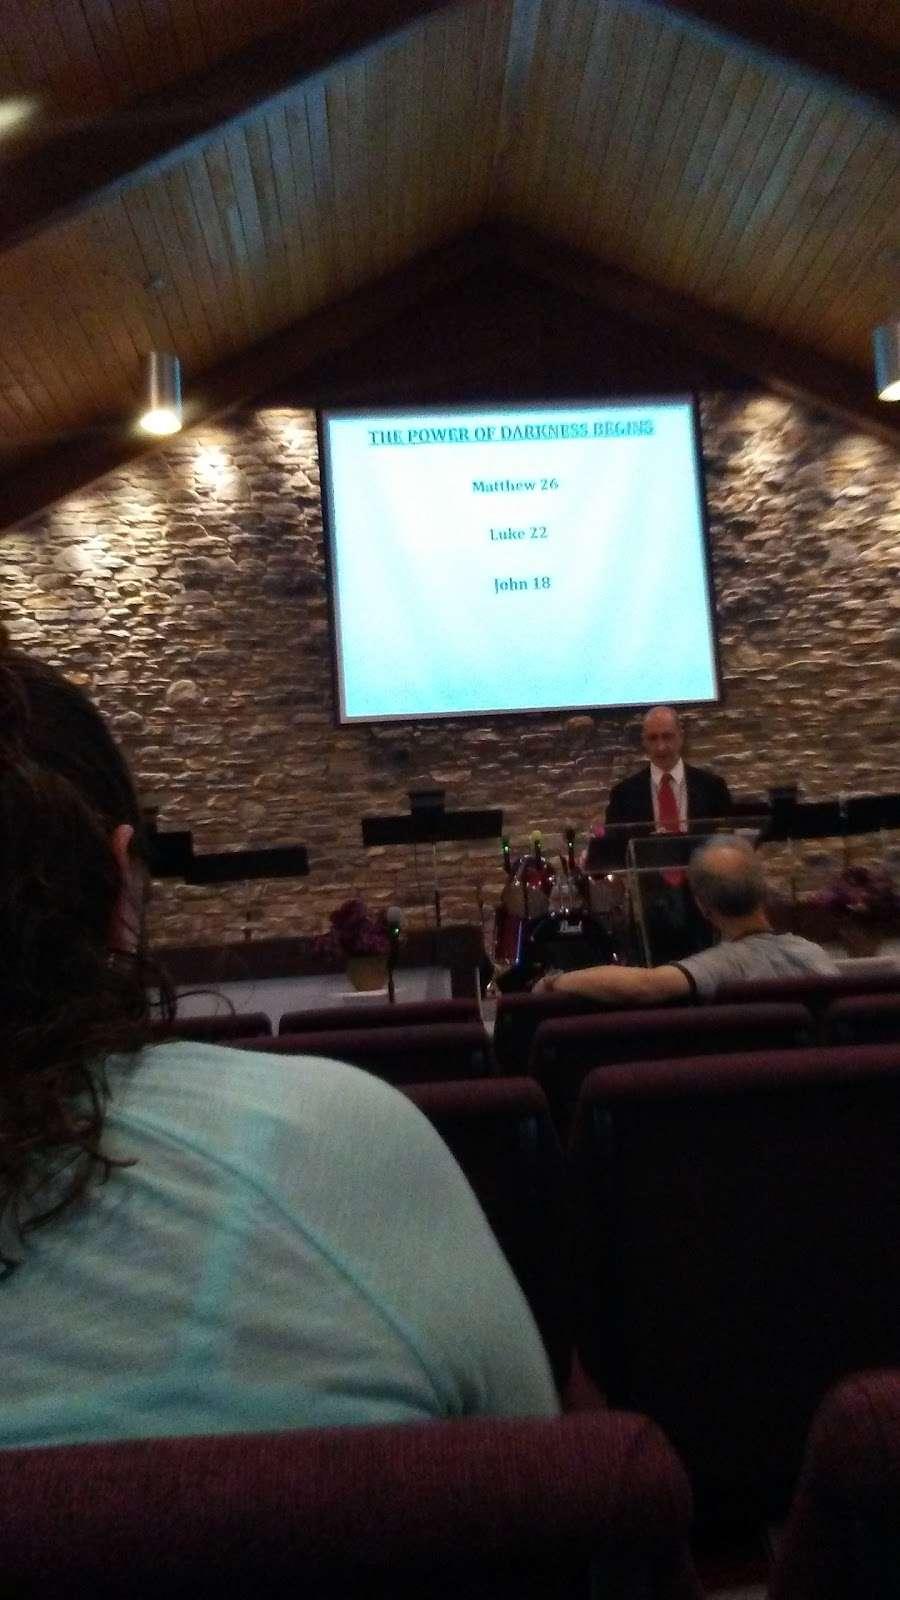 Grace Bible Church - church  | Photo 7 of 7 | Address: 2643 S 117th St, West Allis, WI 53227, USA | Phone: (414) 541-4252